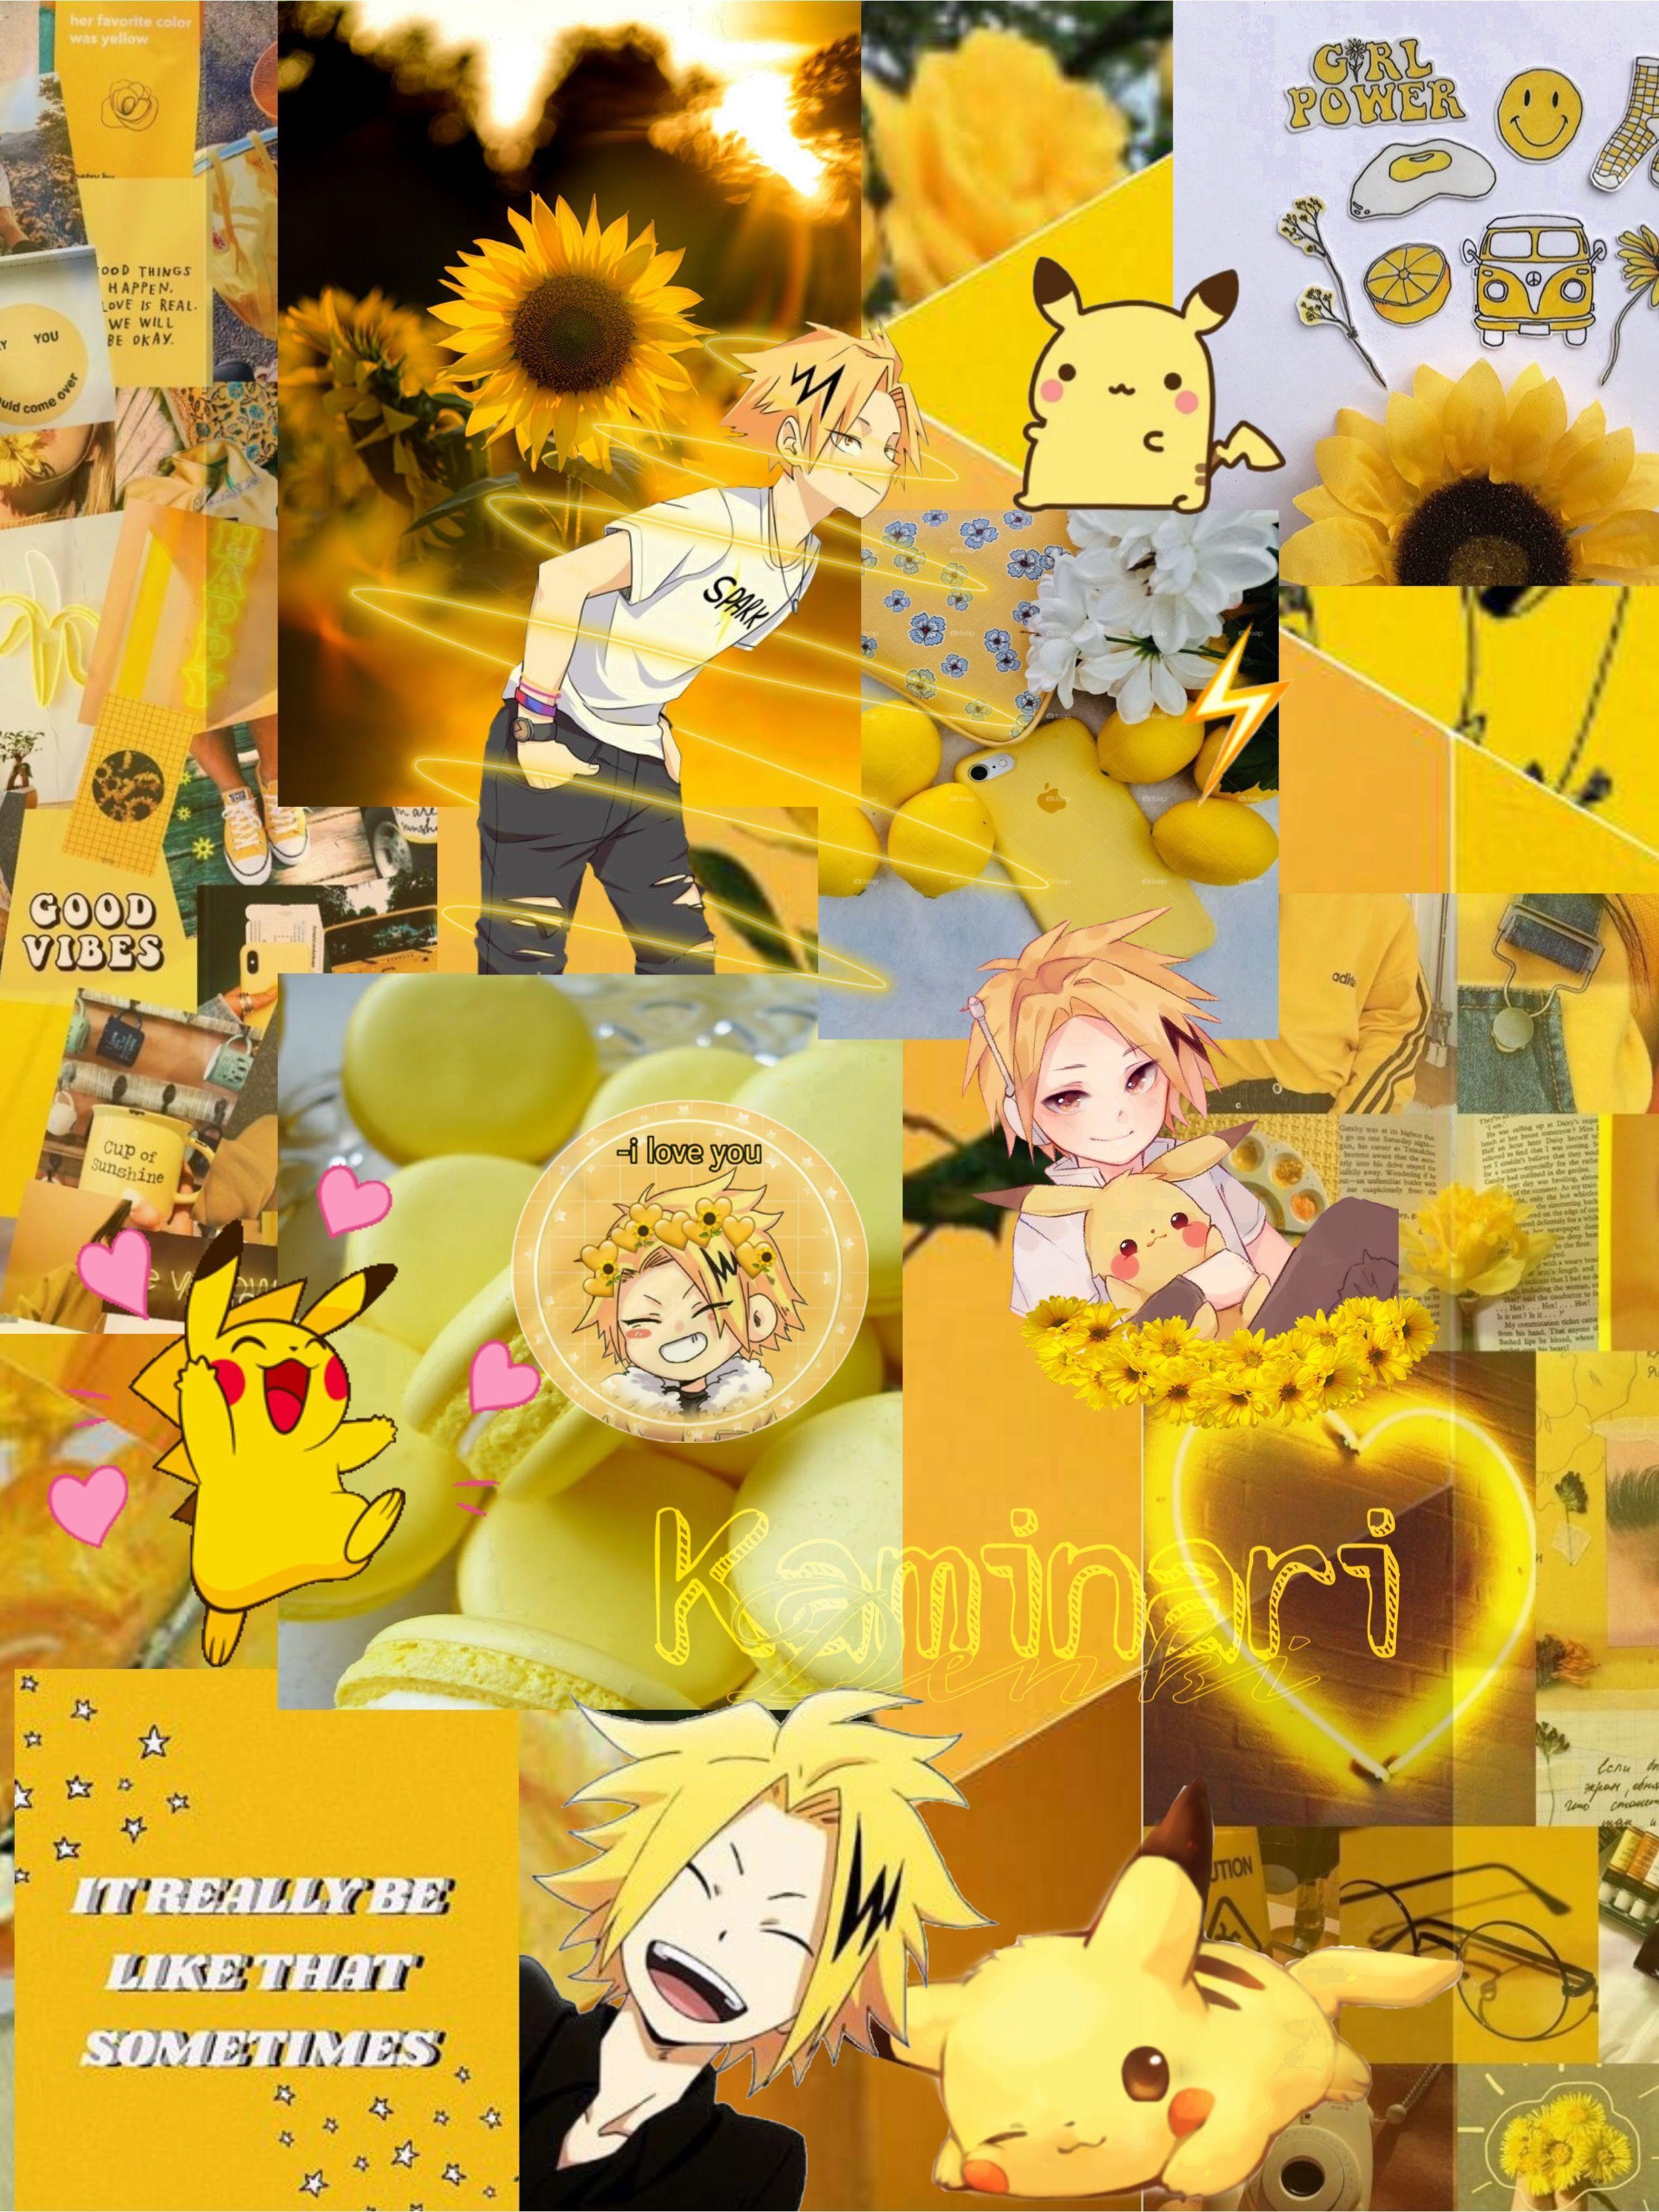 anime wallpaper hd wallpaper scenery yellow anime aesthetic